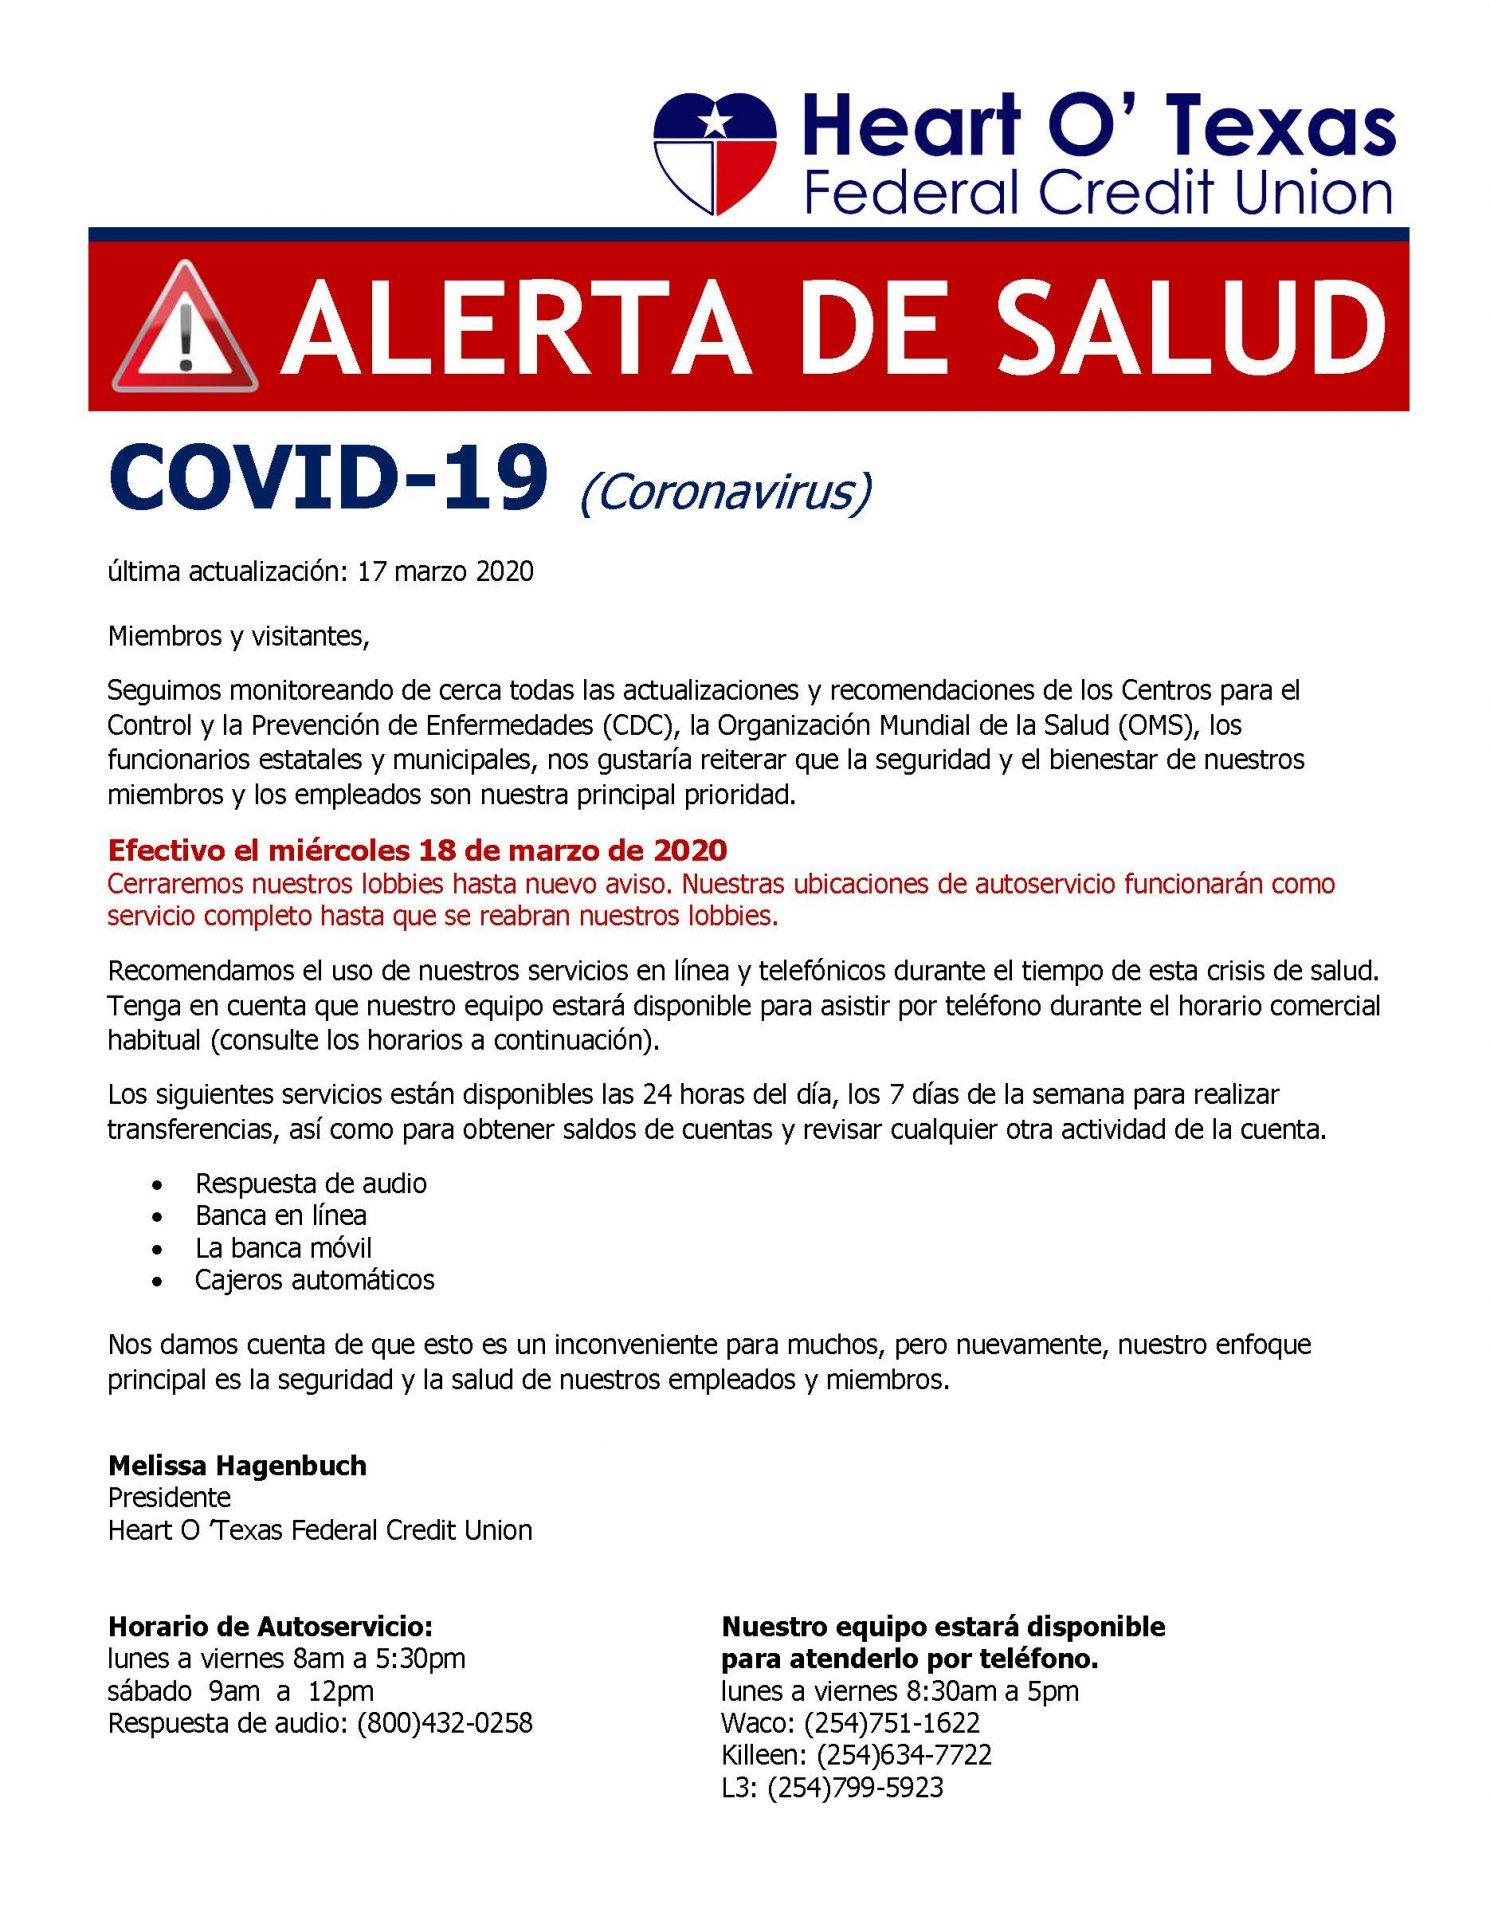 COVID-19 Alert Spanish 2020